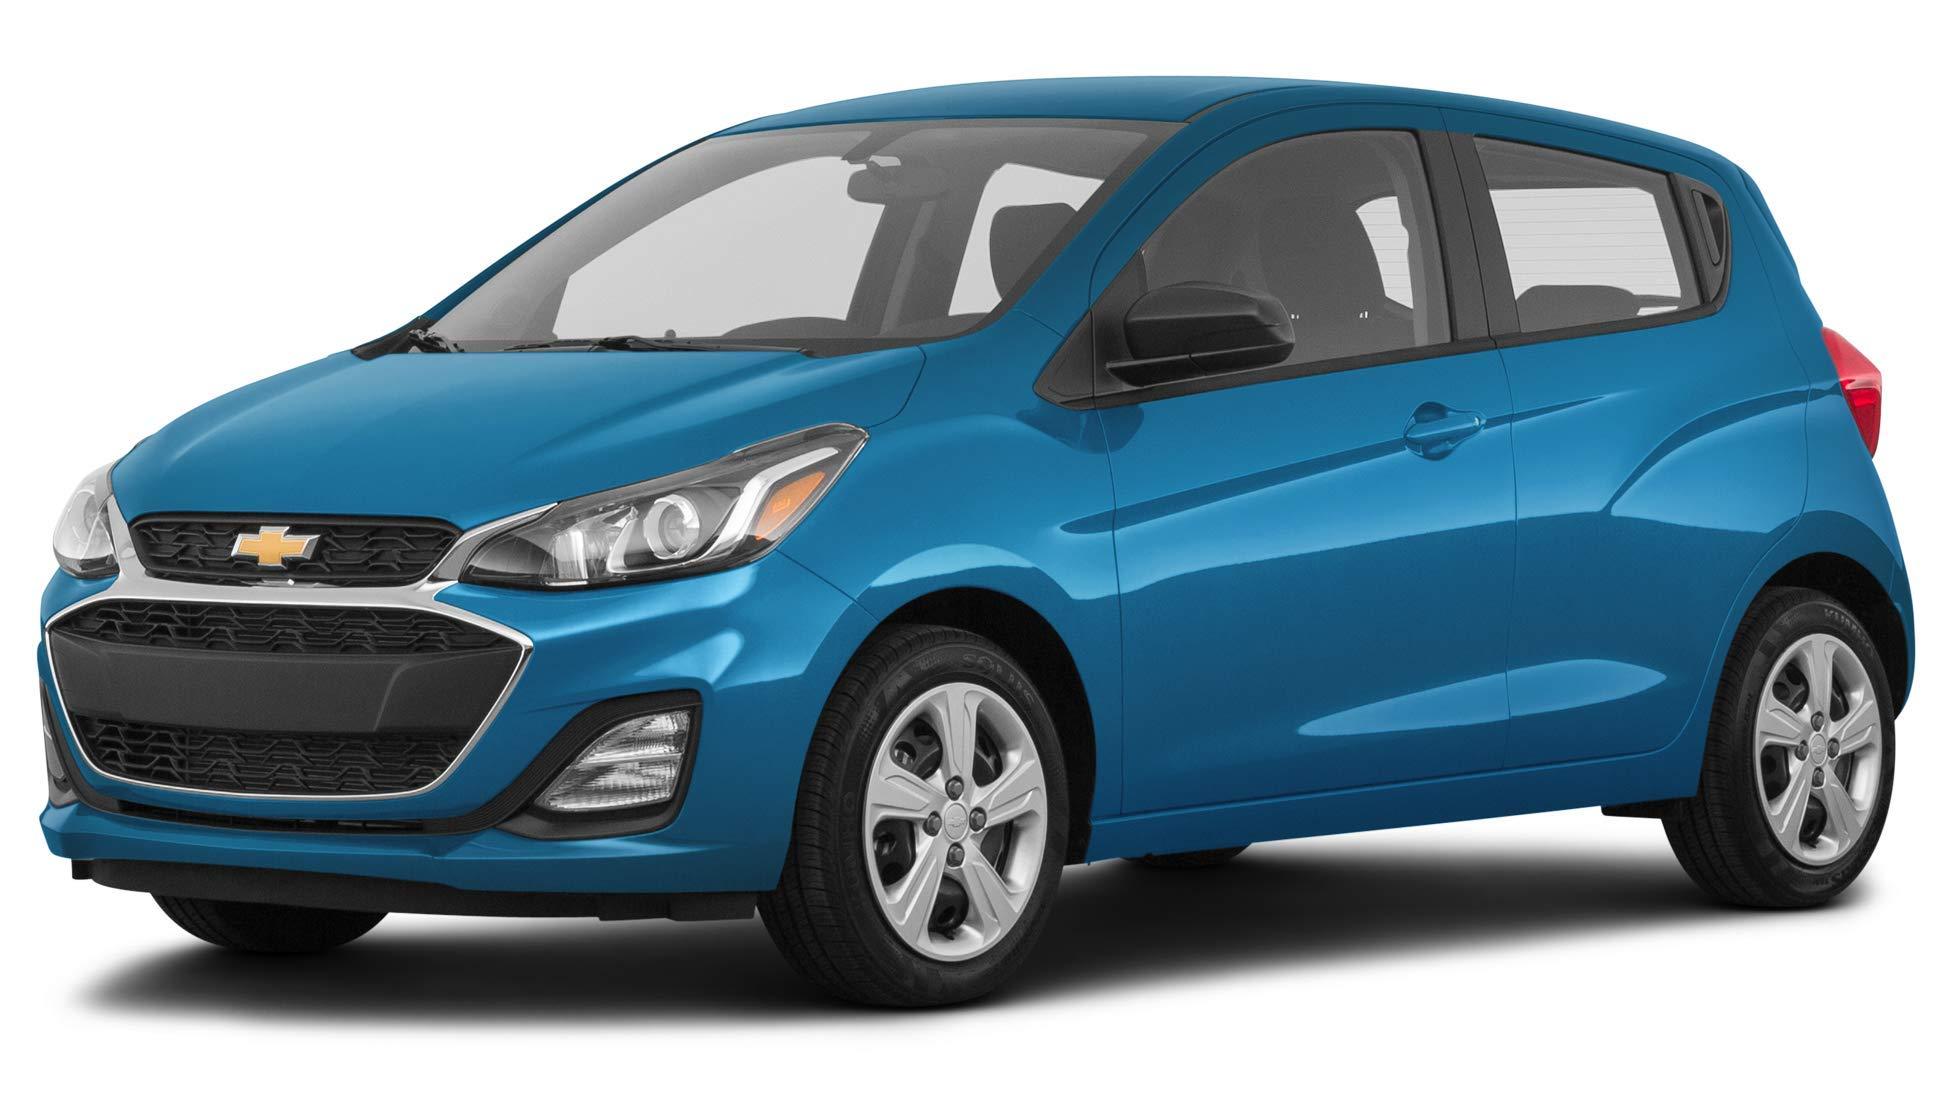 Kelebihan Kekurangan Spark Chevrolet 2019 Review